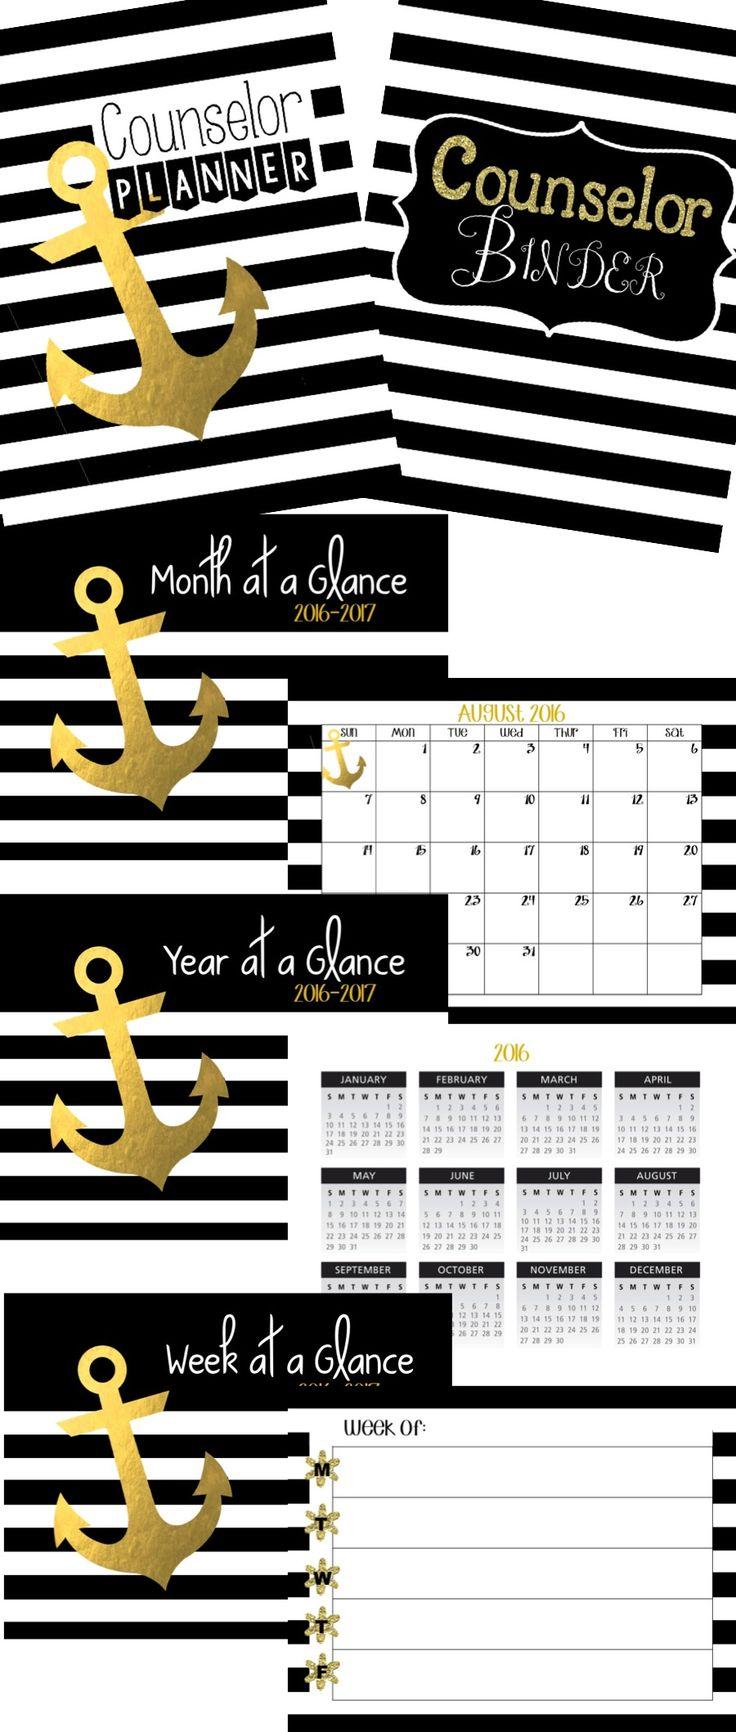 Halloween door decorations mummy downloader - 2016 2017 Comprehensive Counseling Binder Calendar Planner The 2015 16 Version